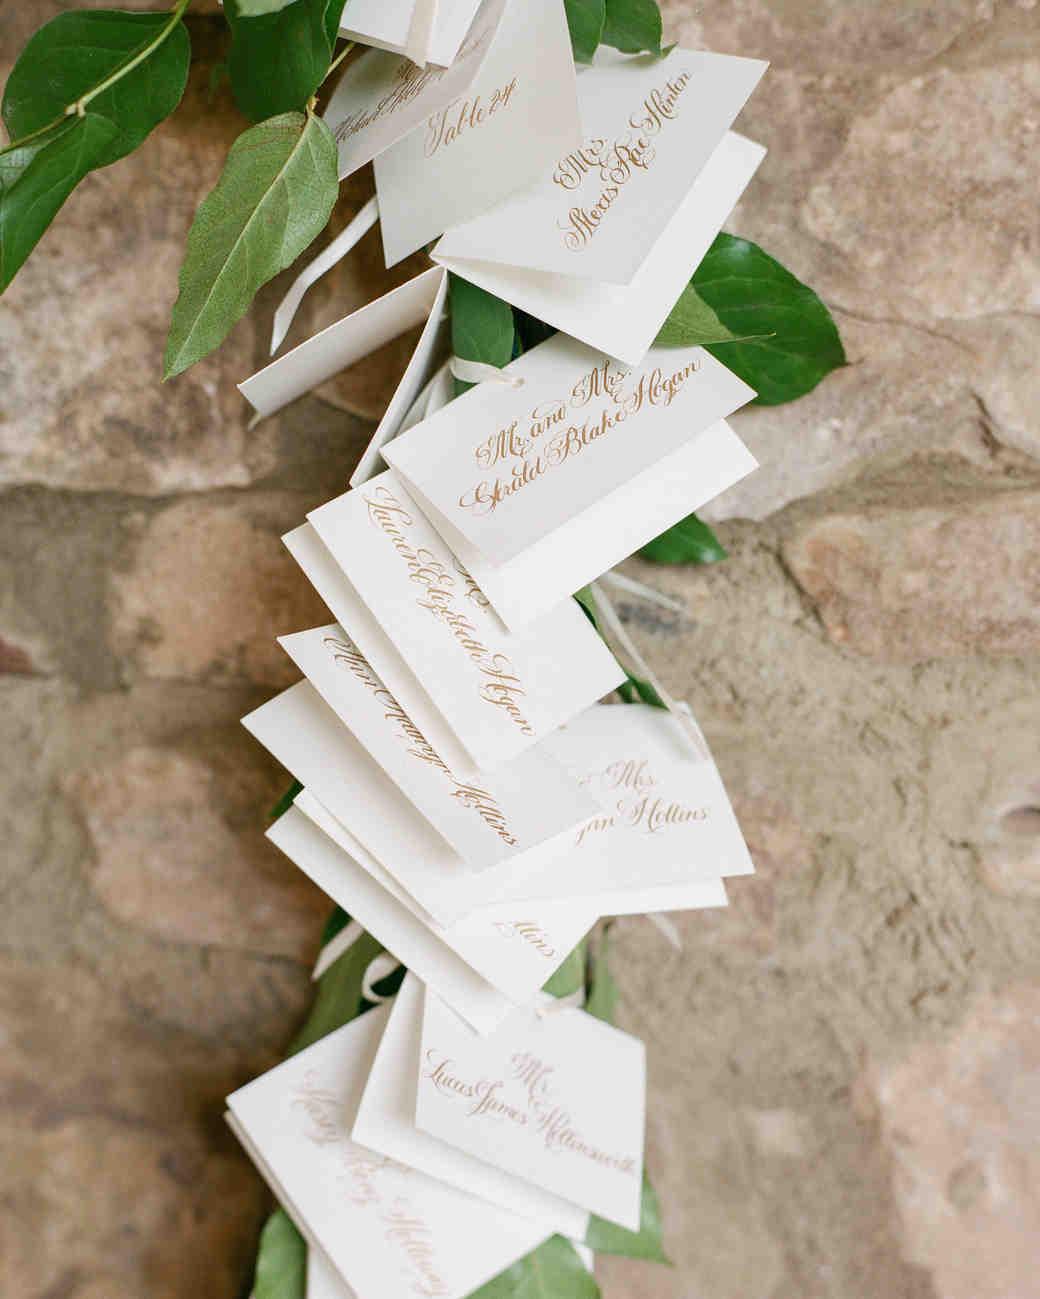 wedding escort cards - Wedding Escort Cards